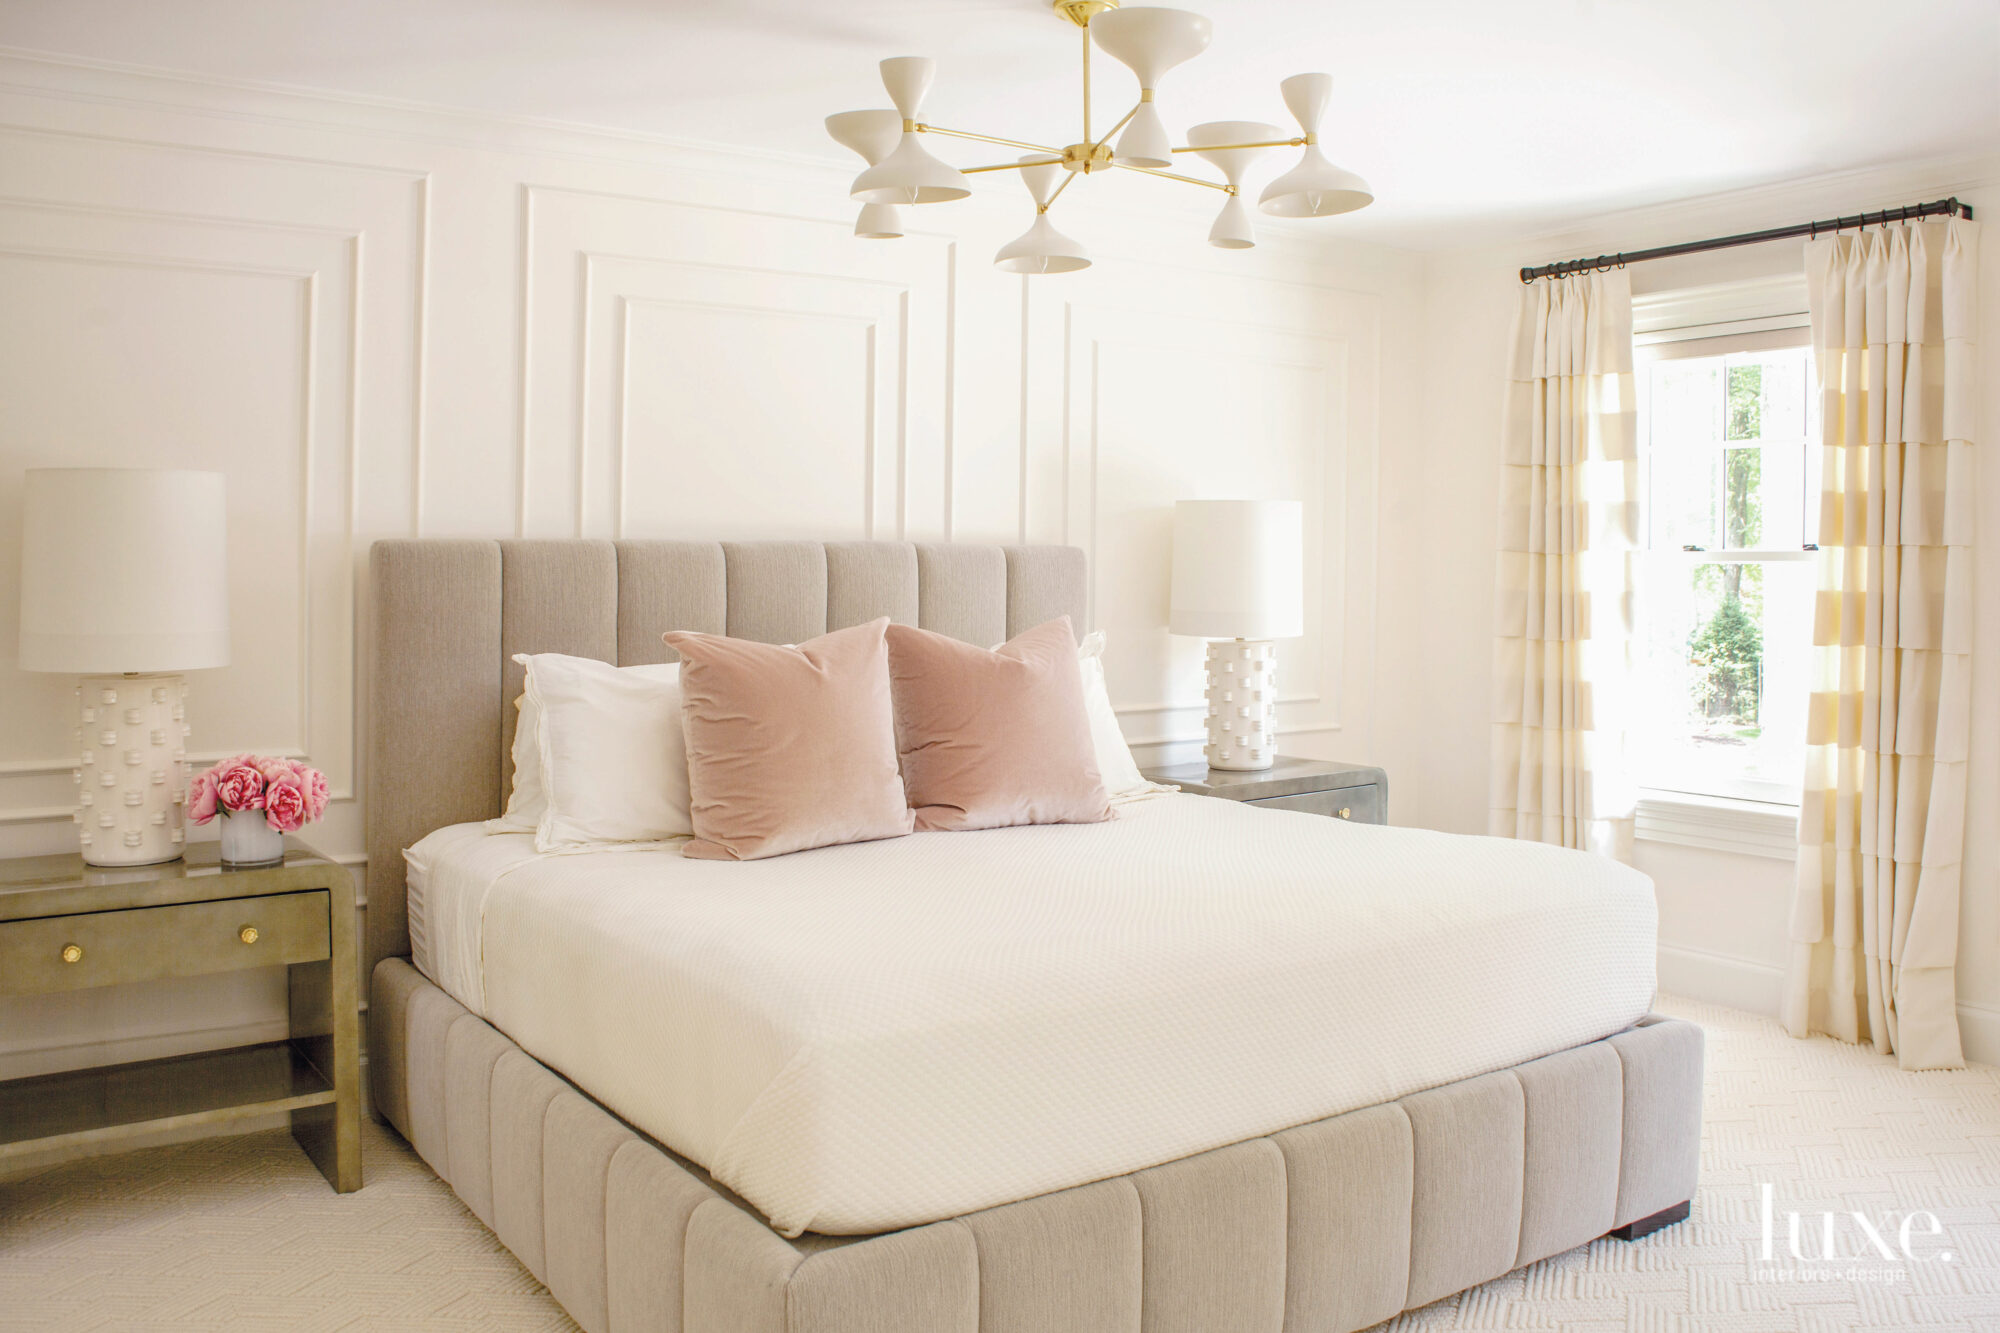 Neutral bedroom with upholstered bedframe